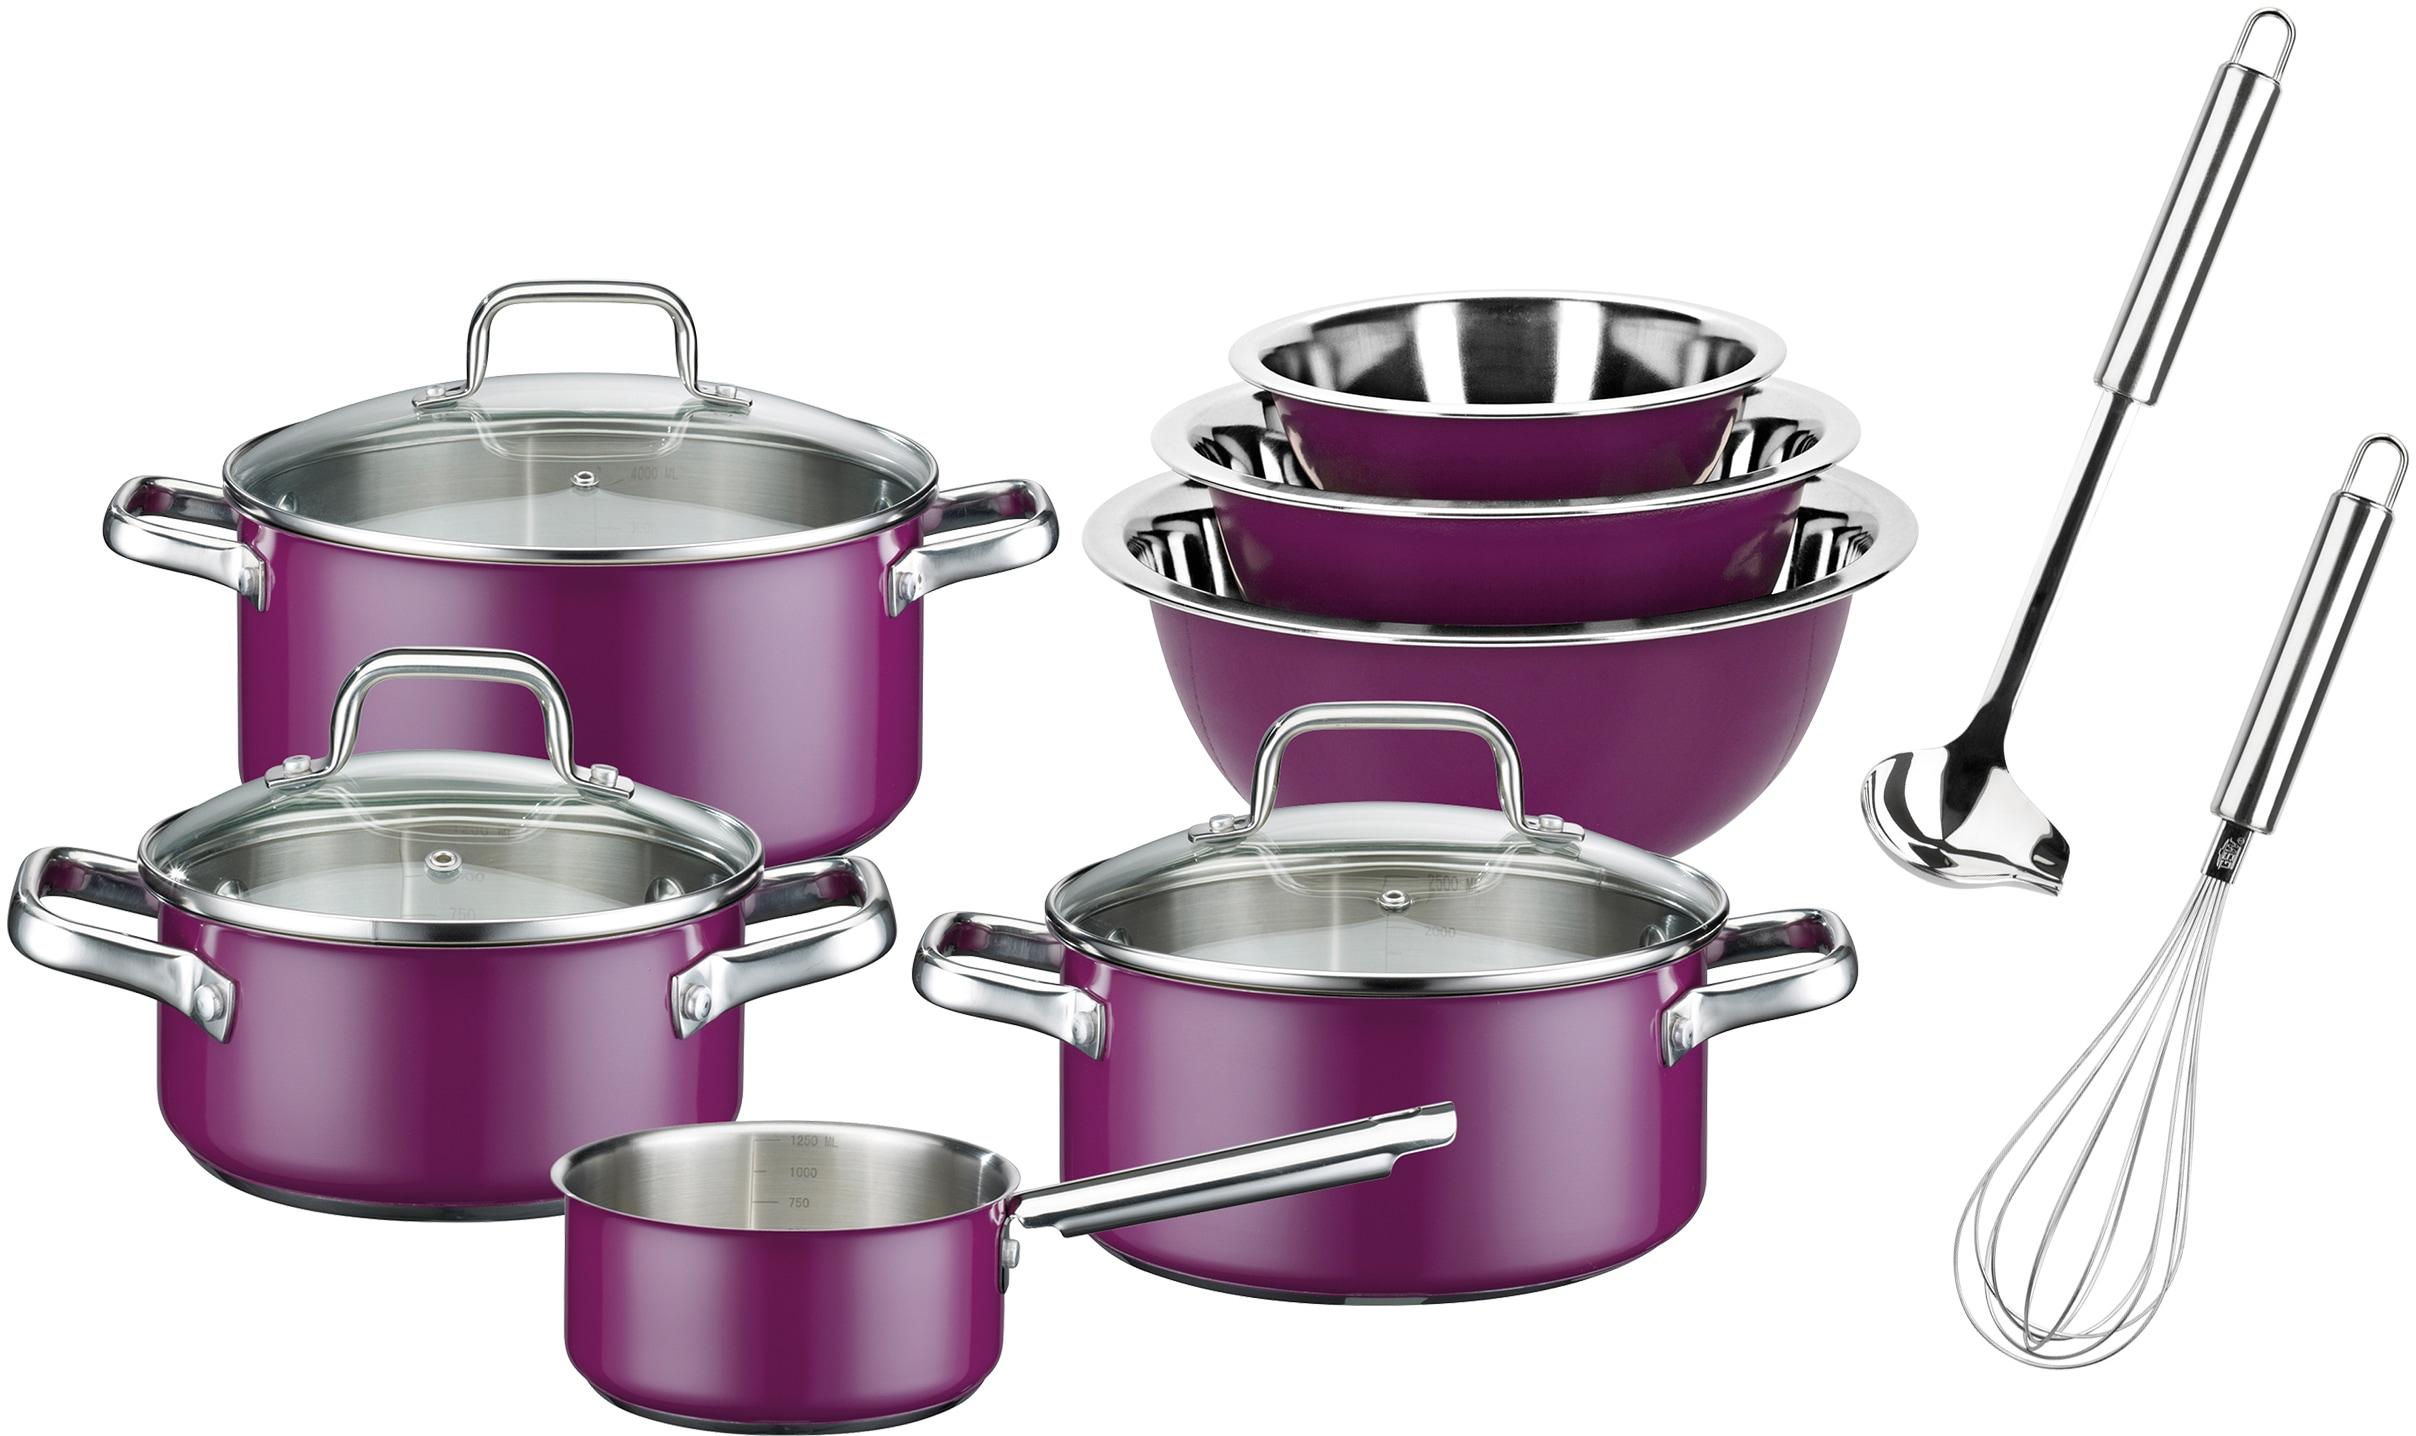 GSW Topf-Set Magic Color, Edelstahl 18/8, (Set, 12 tlg.), Induktion lila Topfsets Töpfe Haushaltswaren